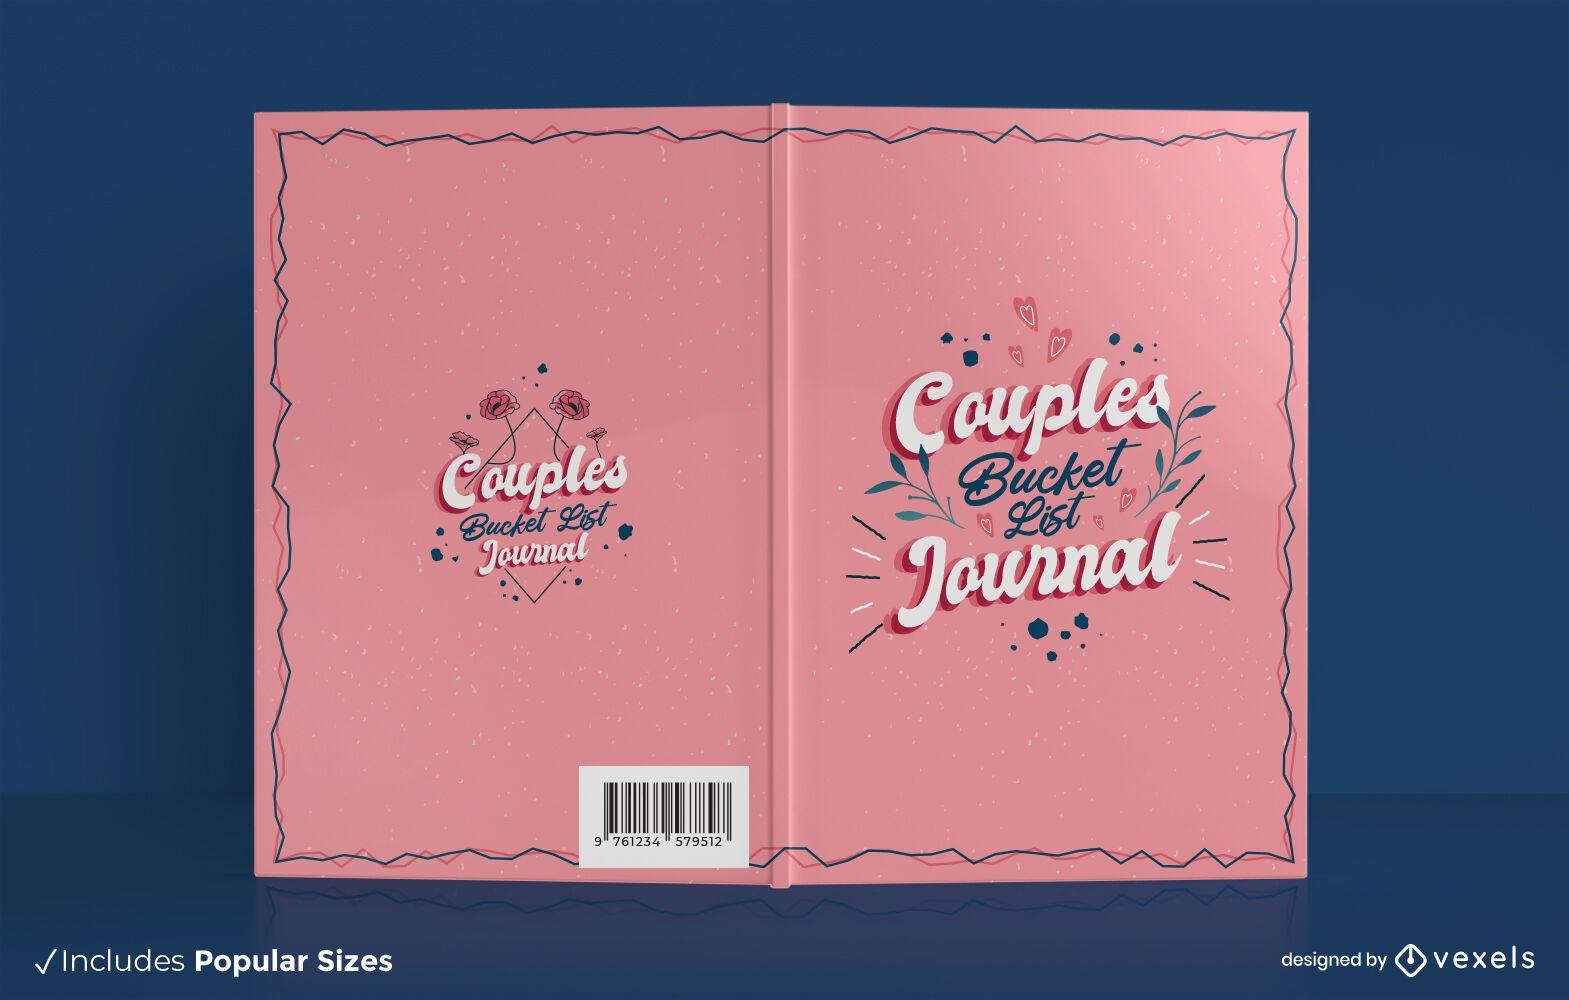 Couple's bucket list book cover design